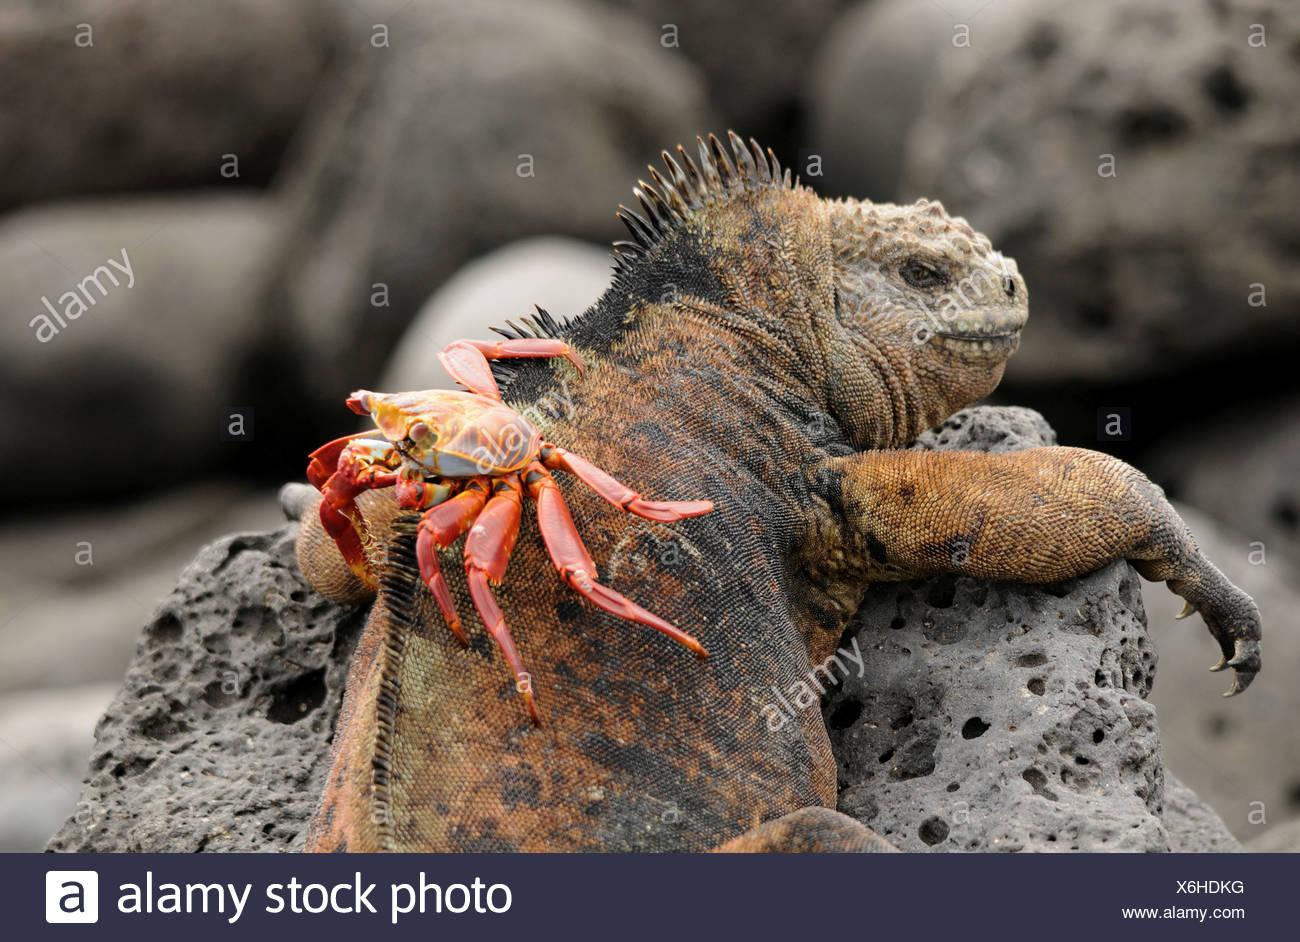 Galapagos sea lizard with no uncertain crab - Stock Image